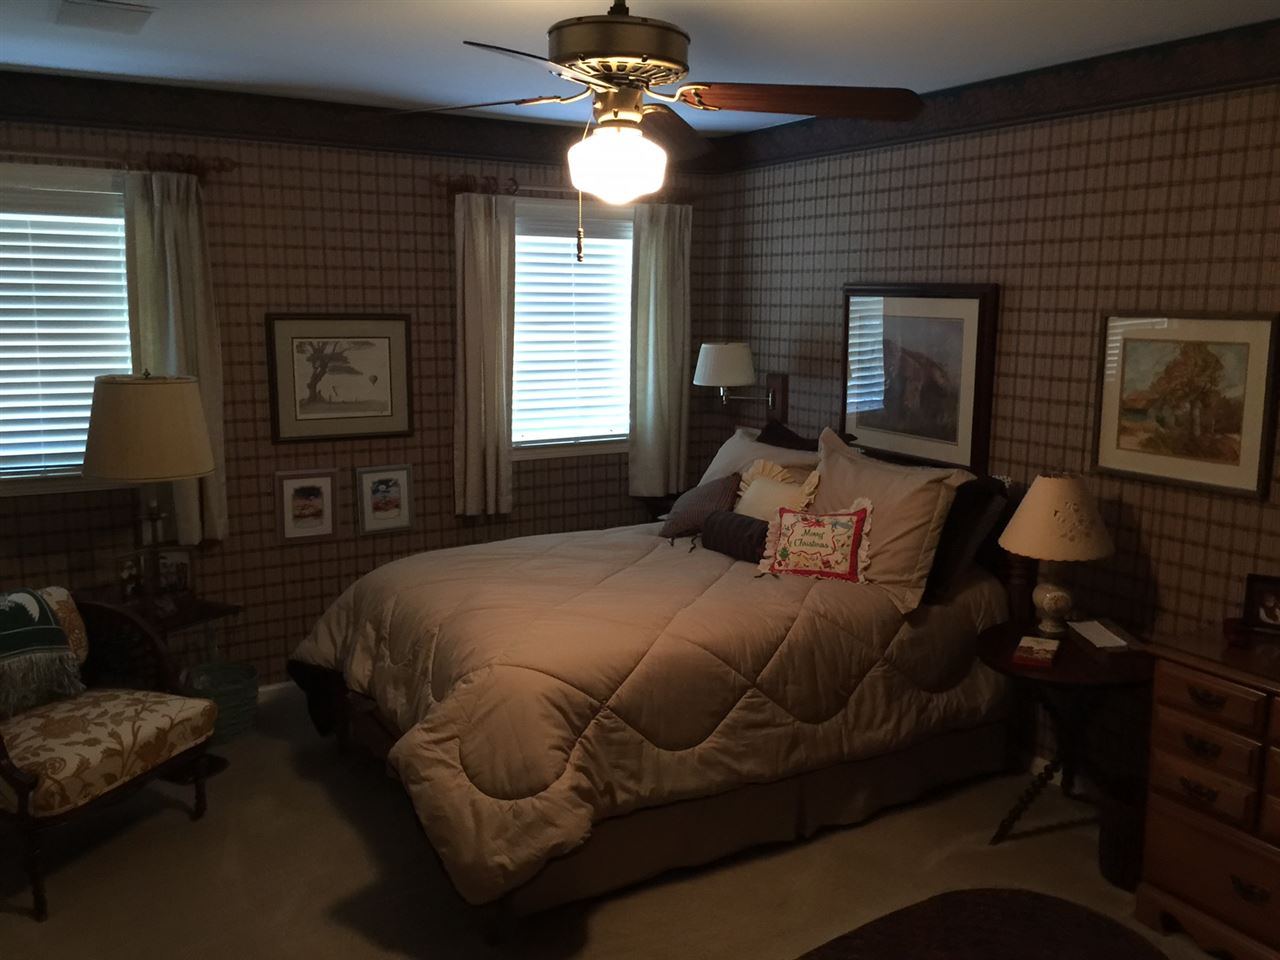 6200 Shady Grove Memphis, TN 38120 - MLS #: 10000892